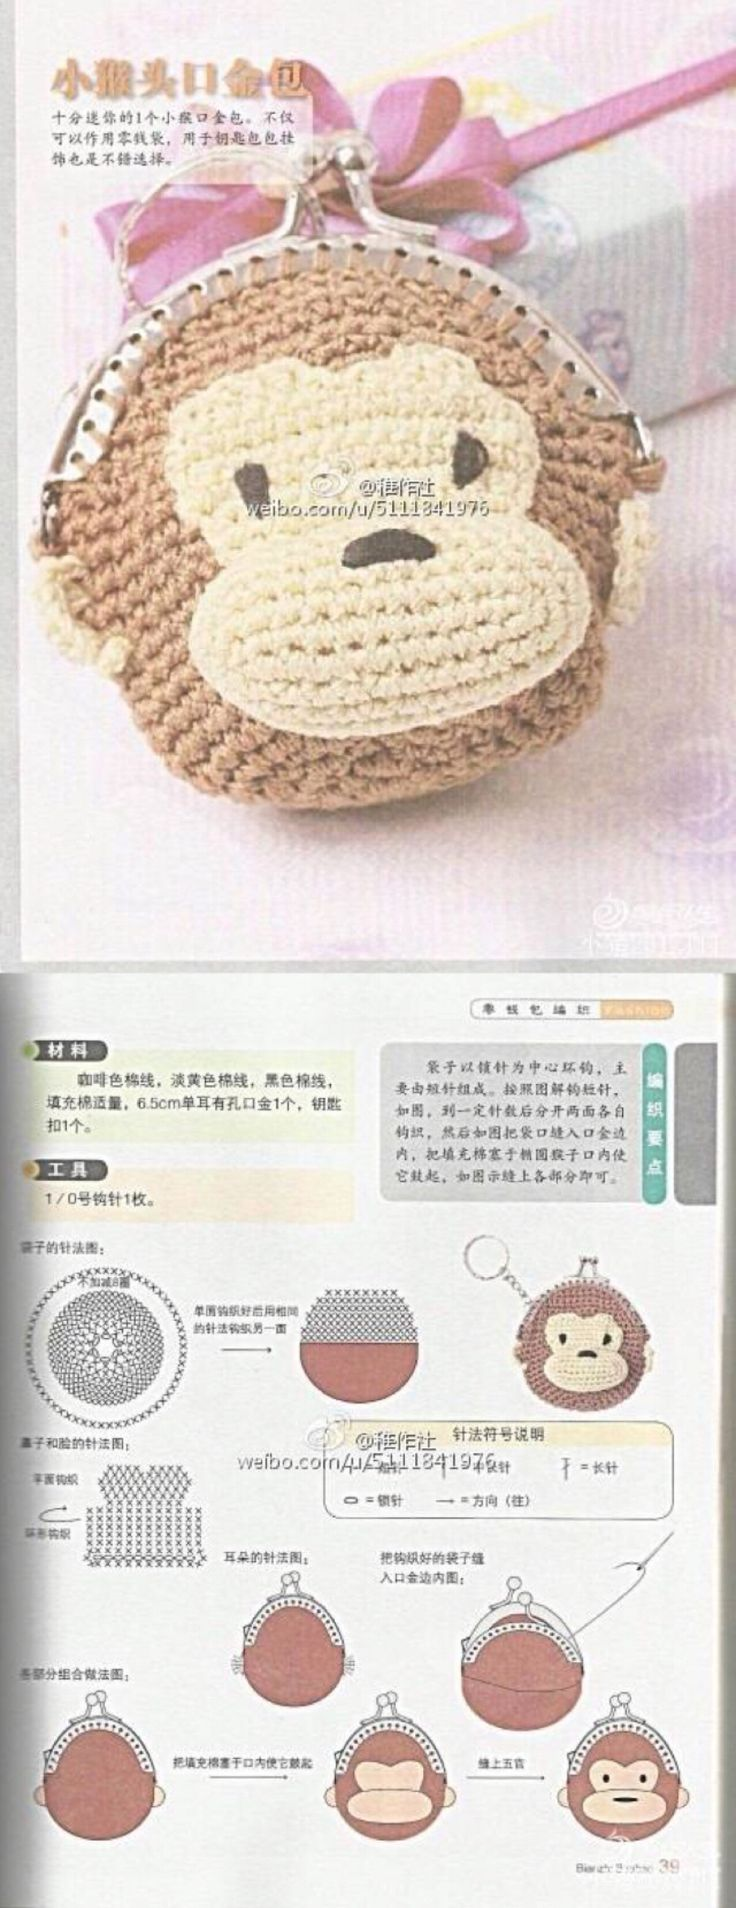 Crochet animal coin purse